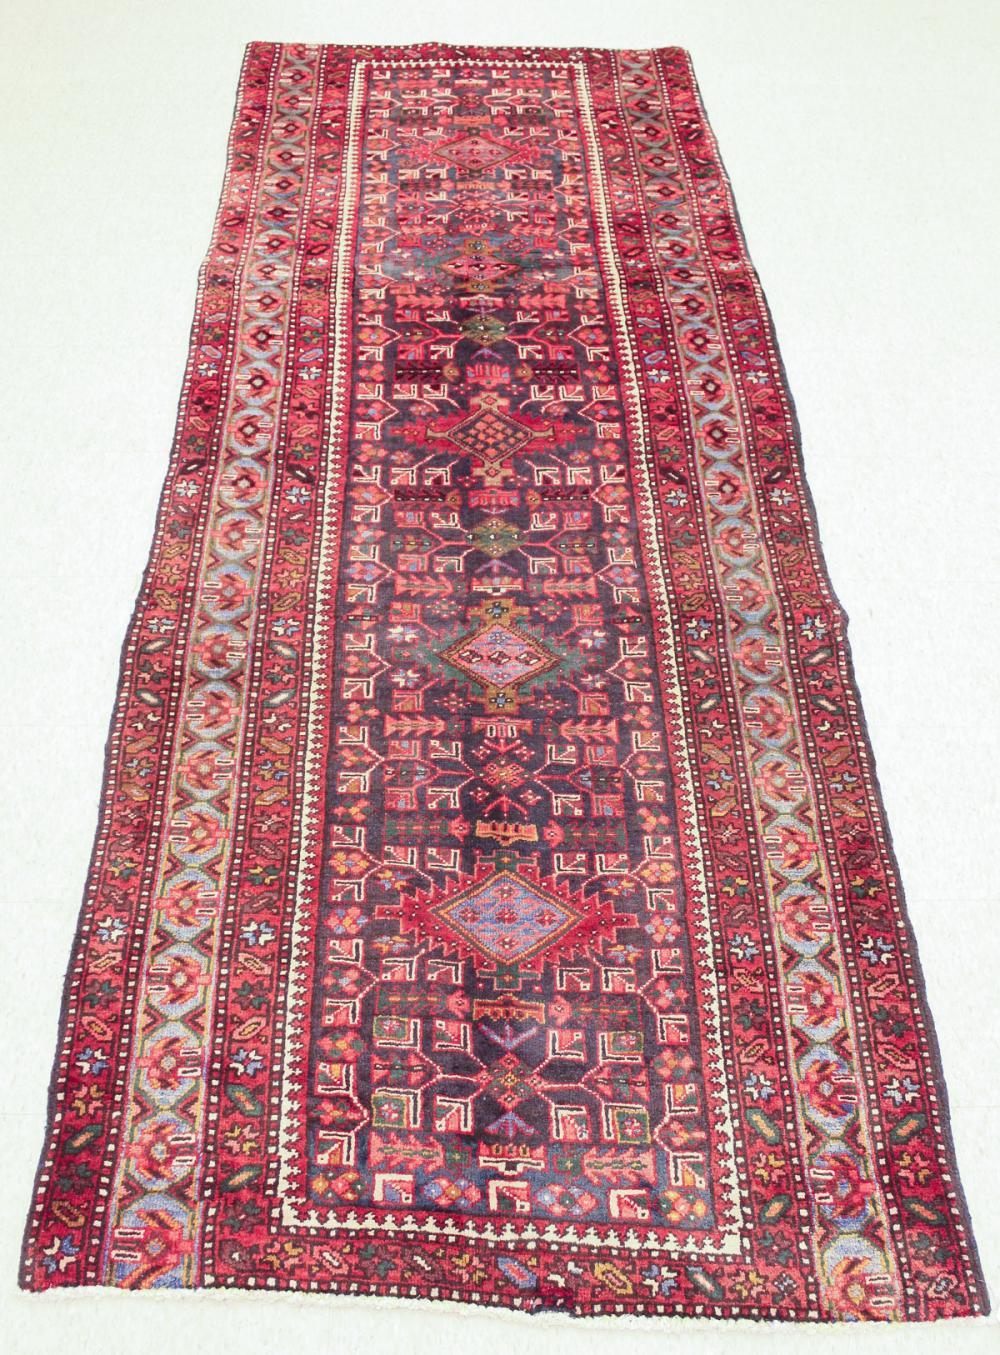 HAND KNOTTED PERSIAN SEMI-ANTIQUE AREA RUG, Bijar